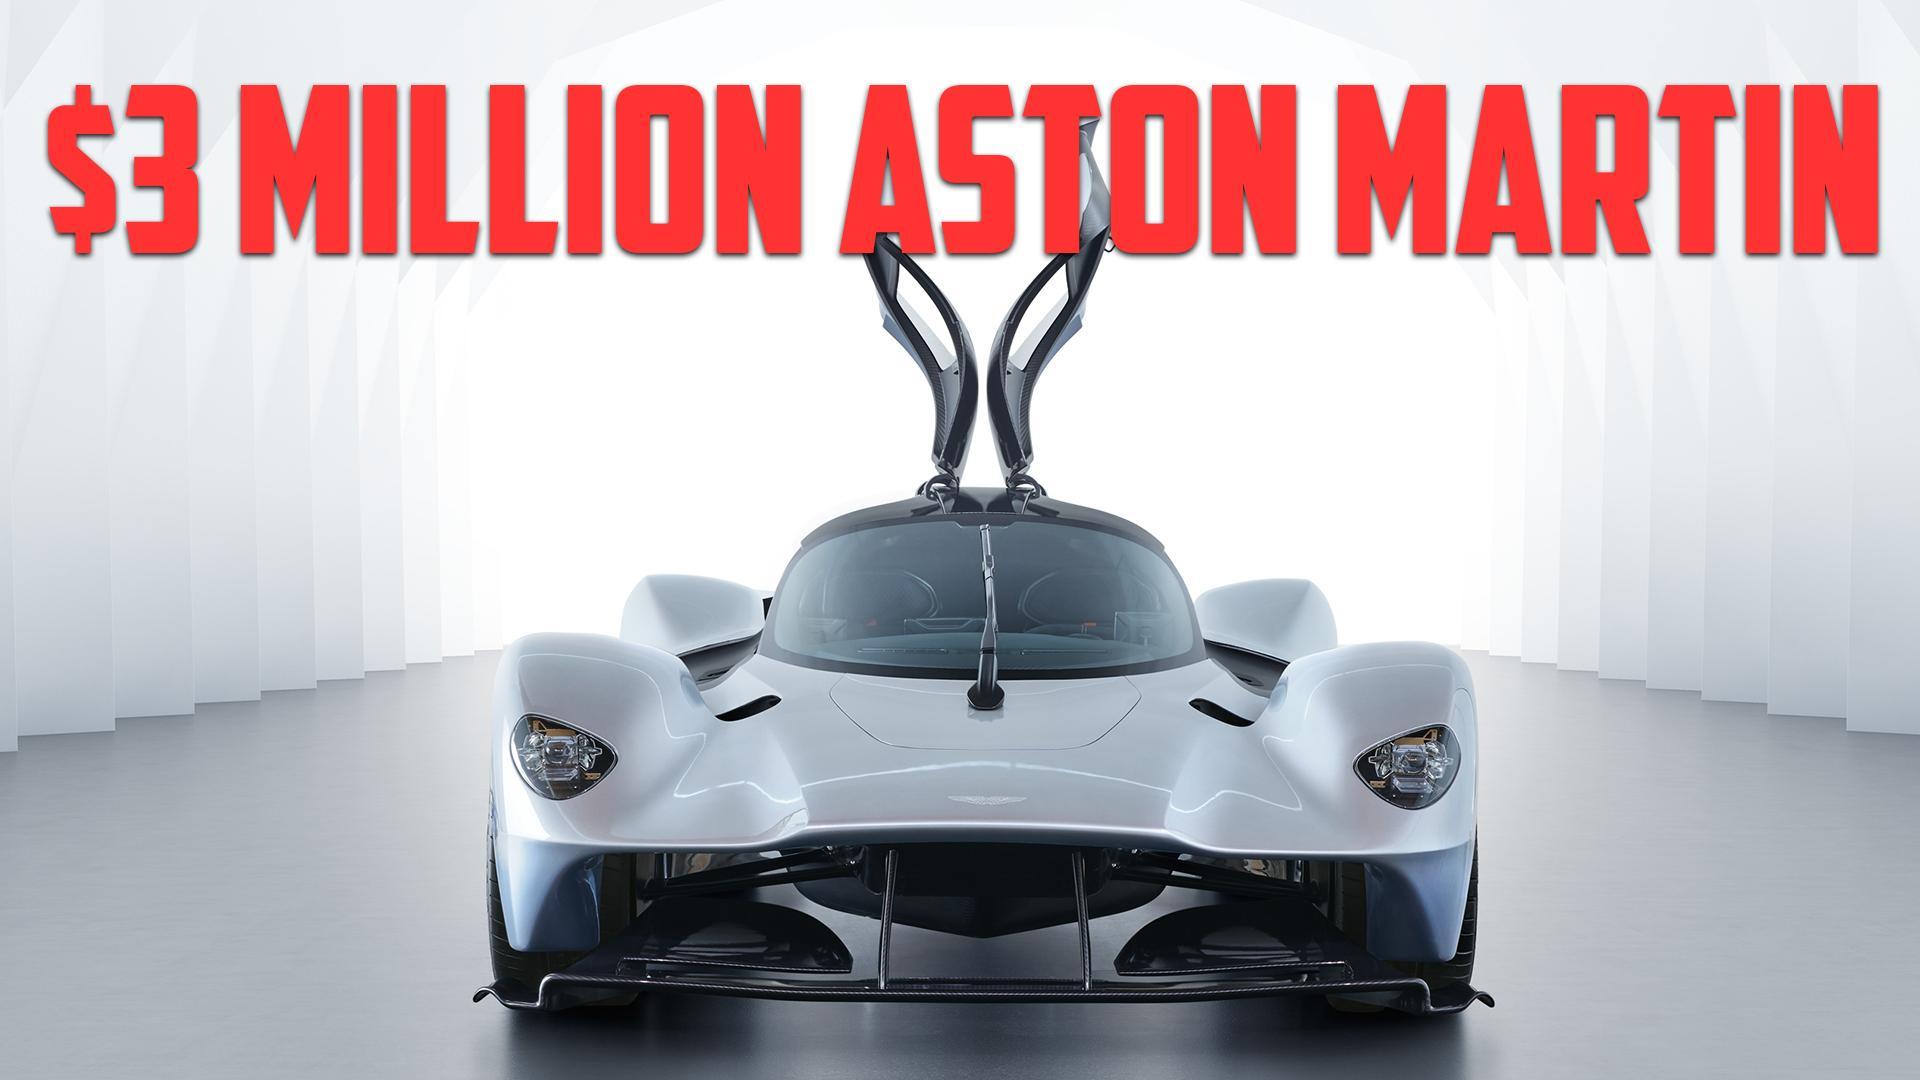 the aston martin valkyrie sounds like a formula 1 car - autoblog